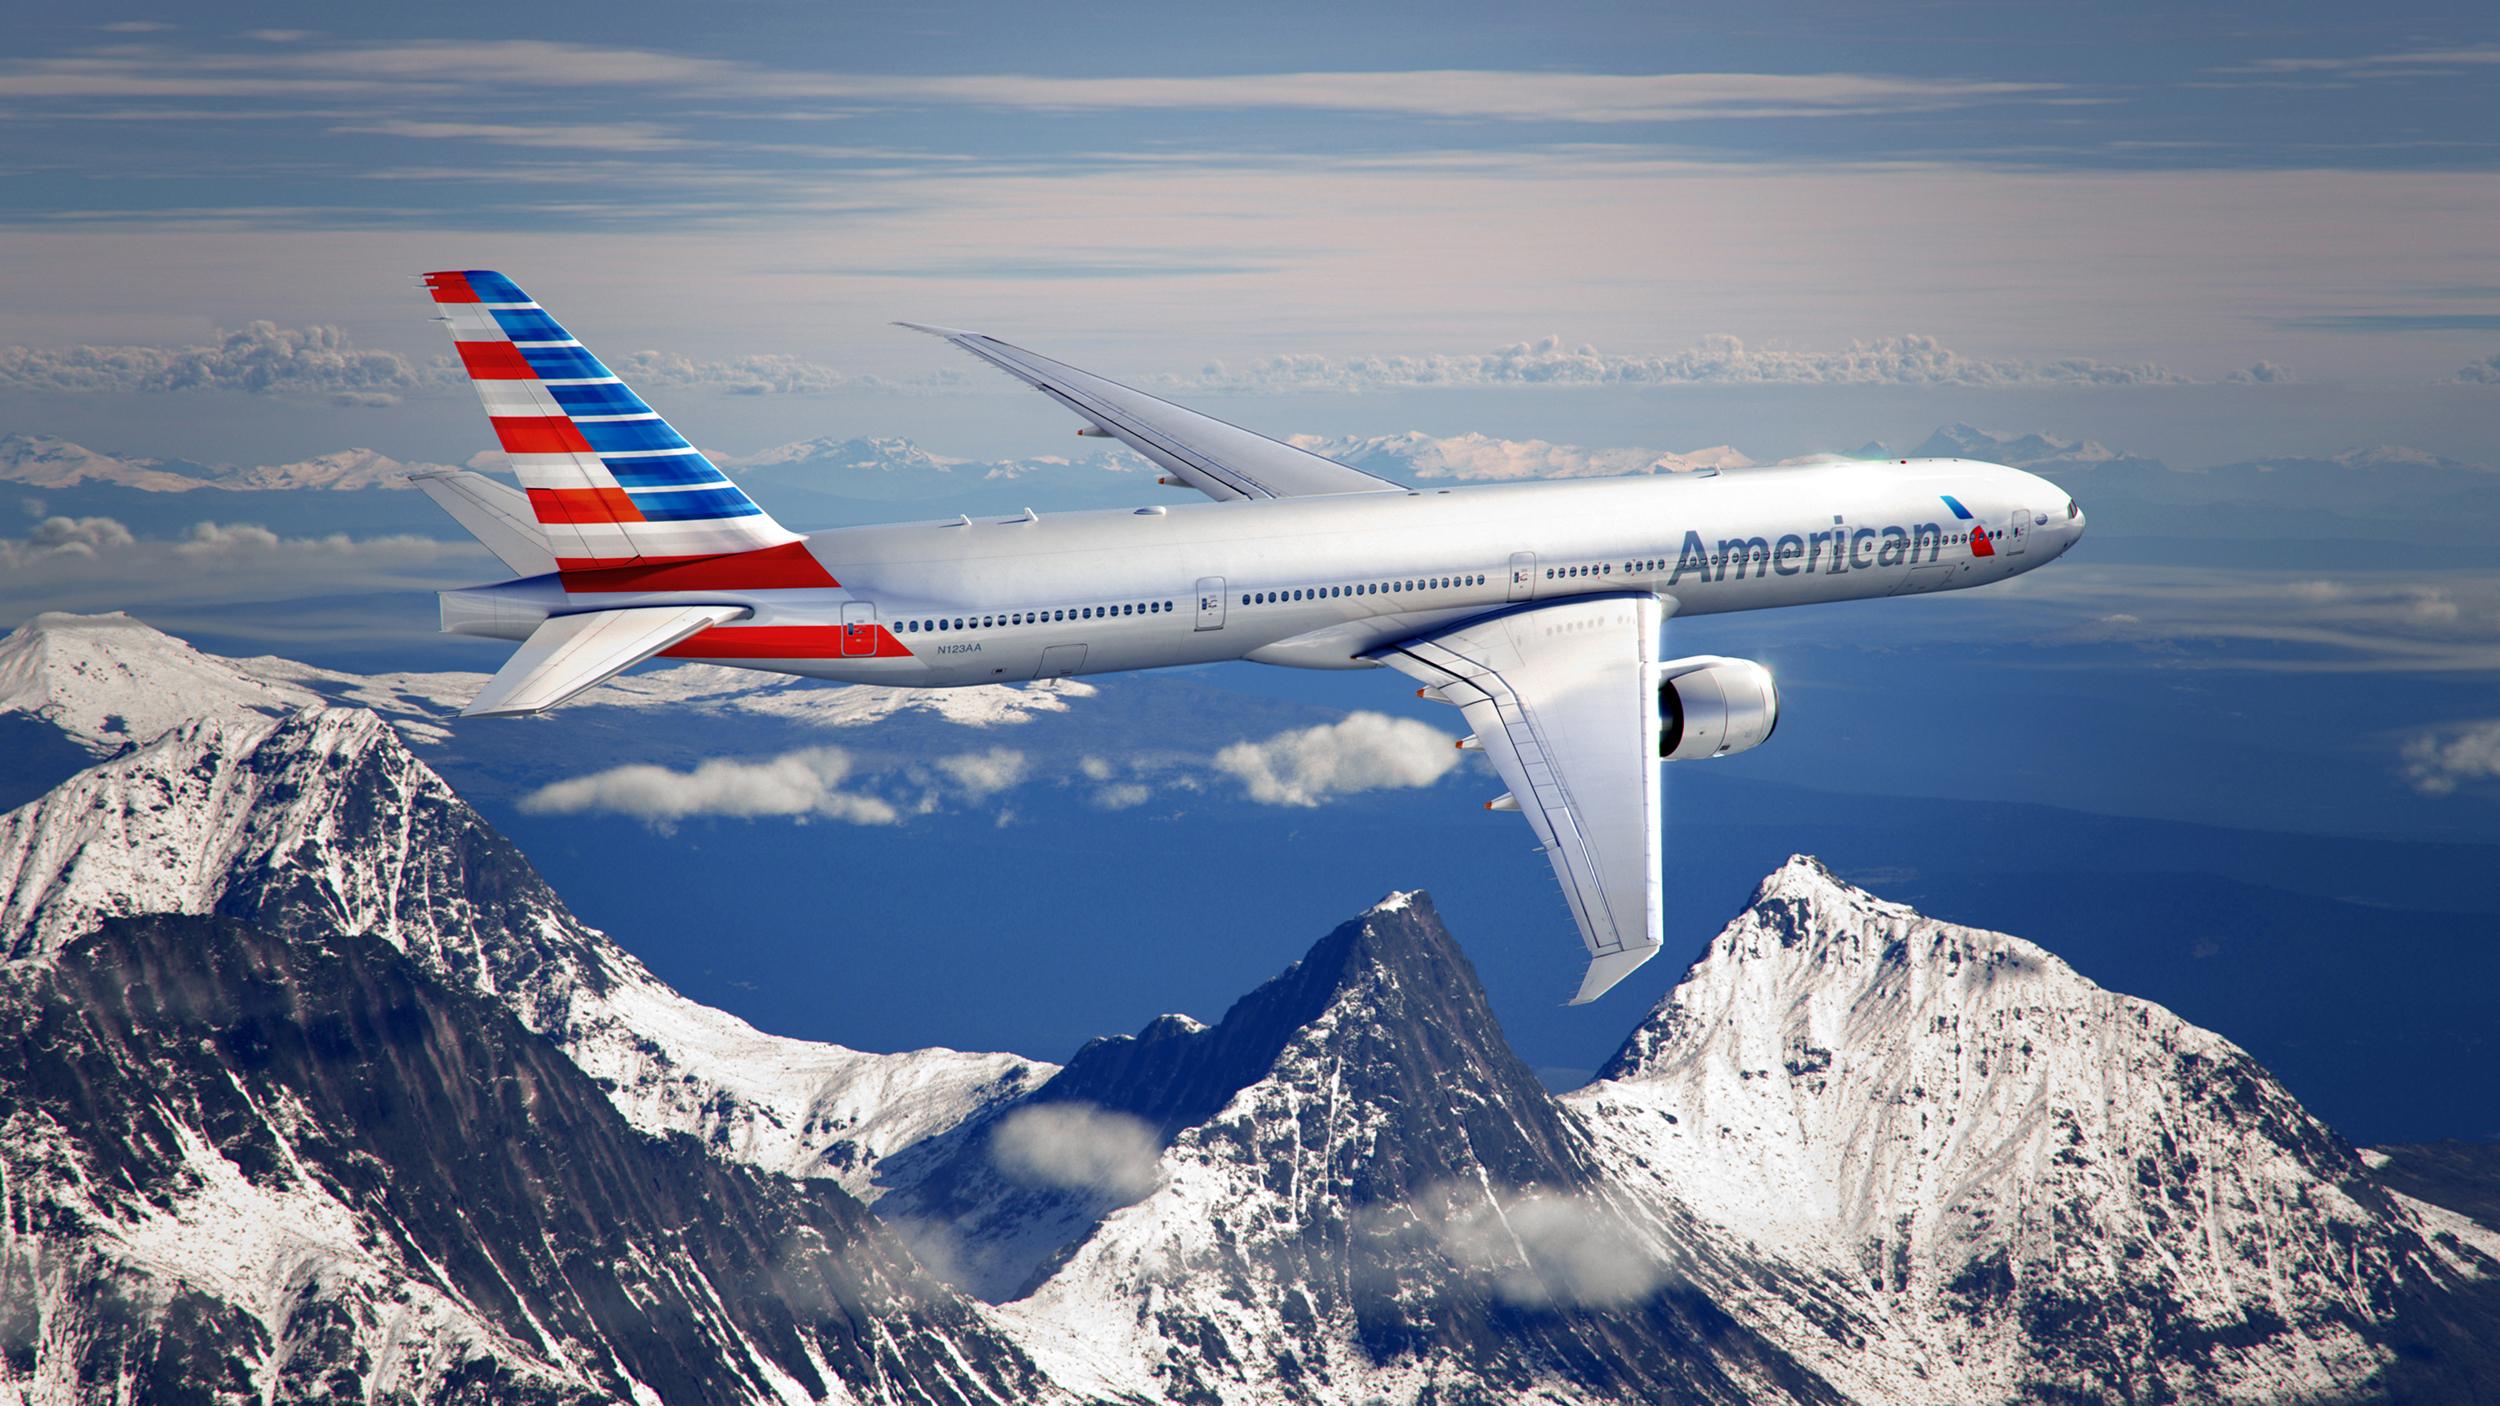 American Airlines Earnings: More Underperformance